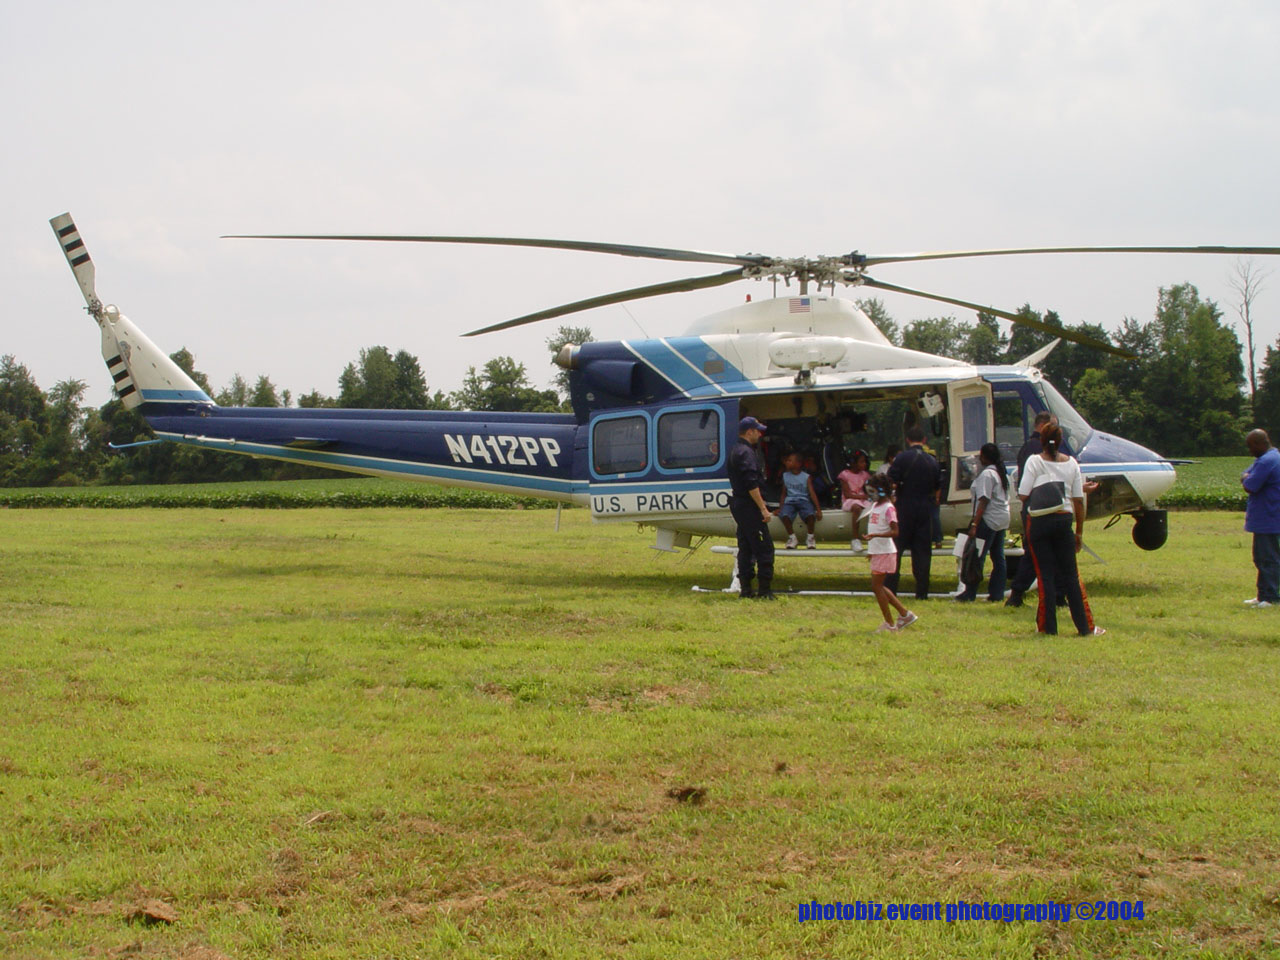 KLM-04 010.jpg